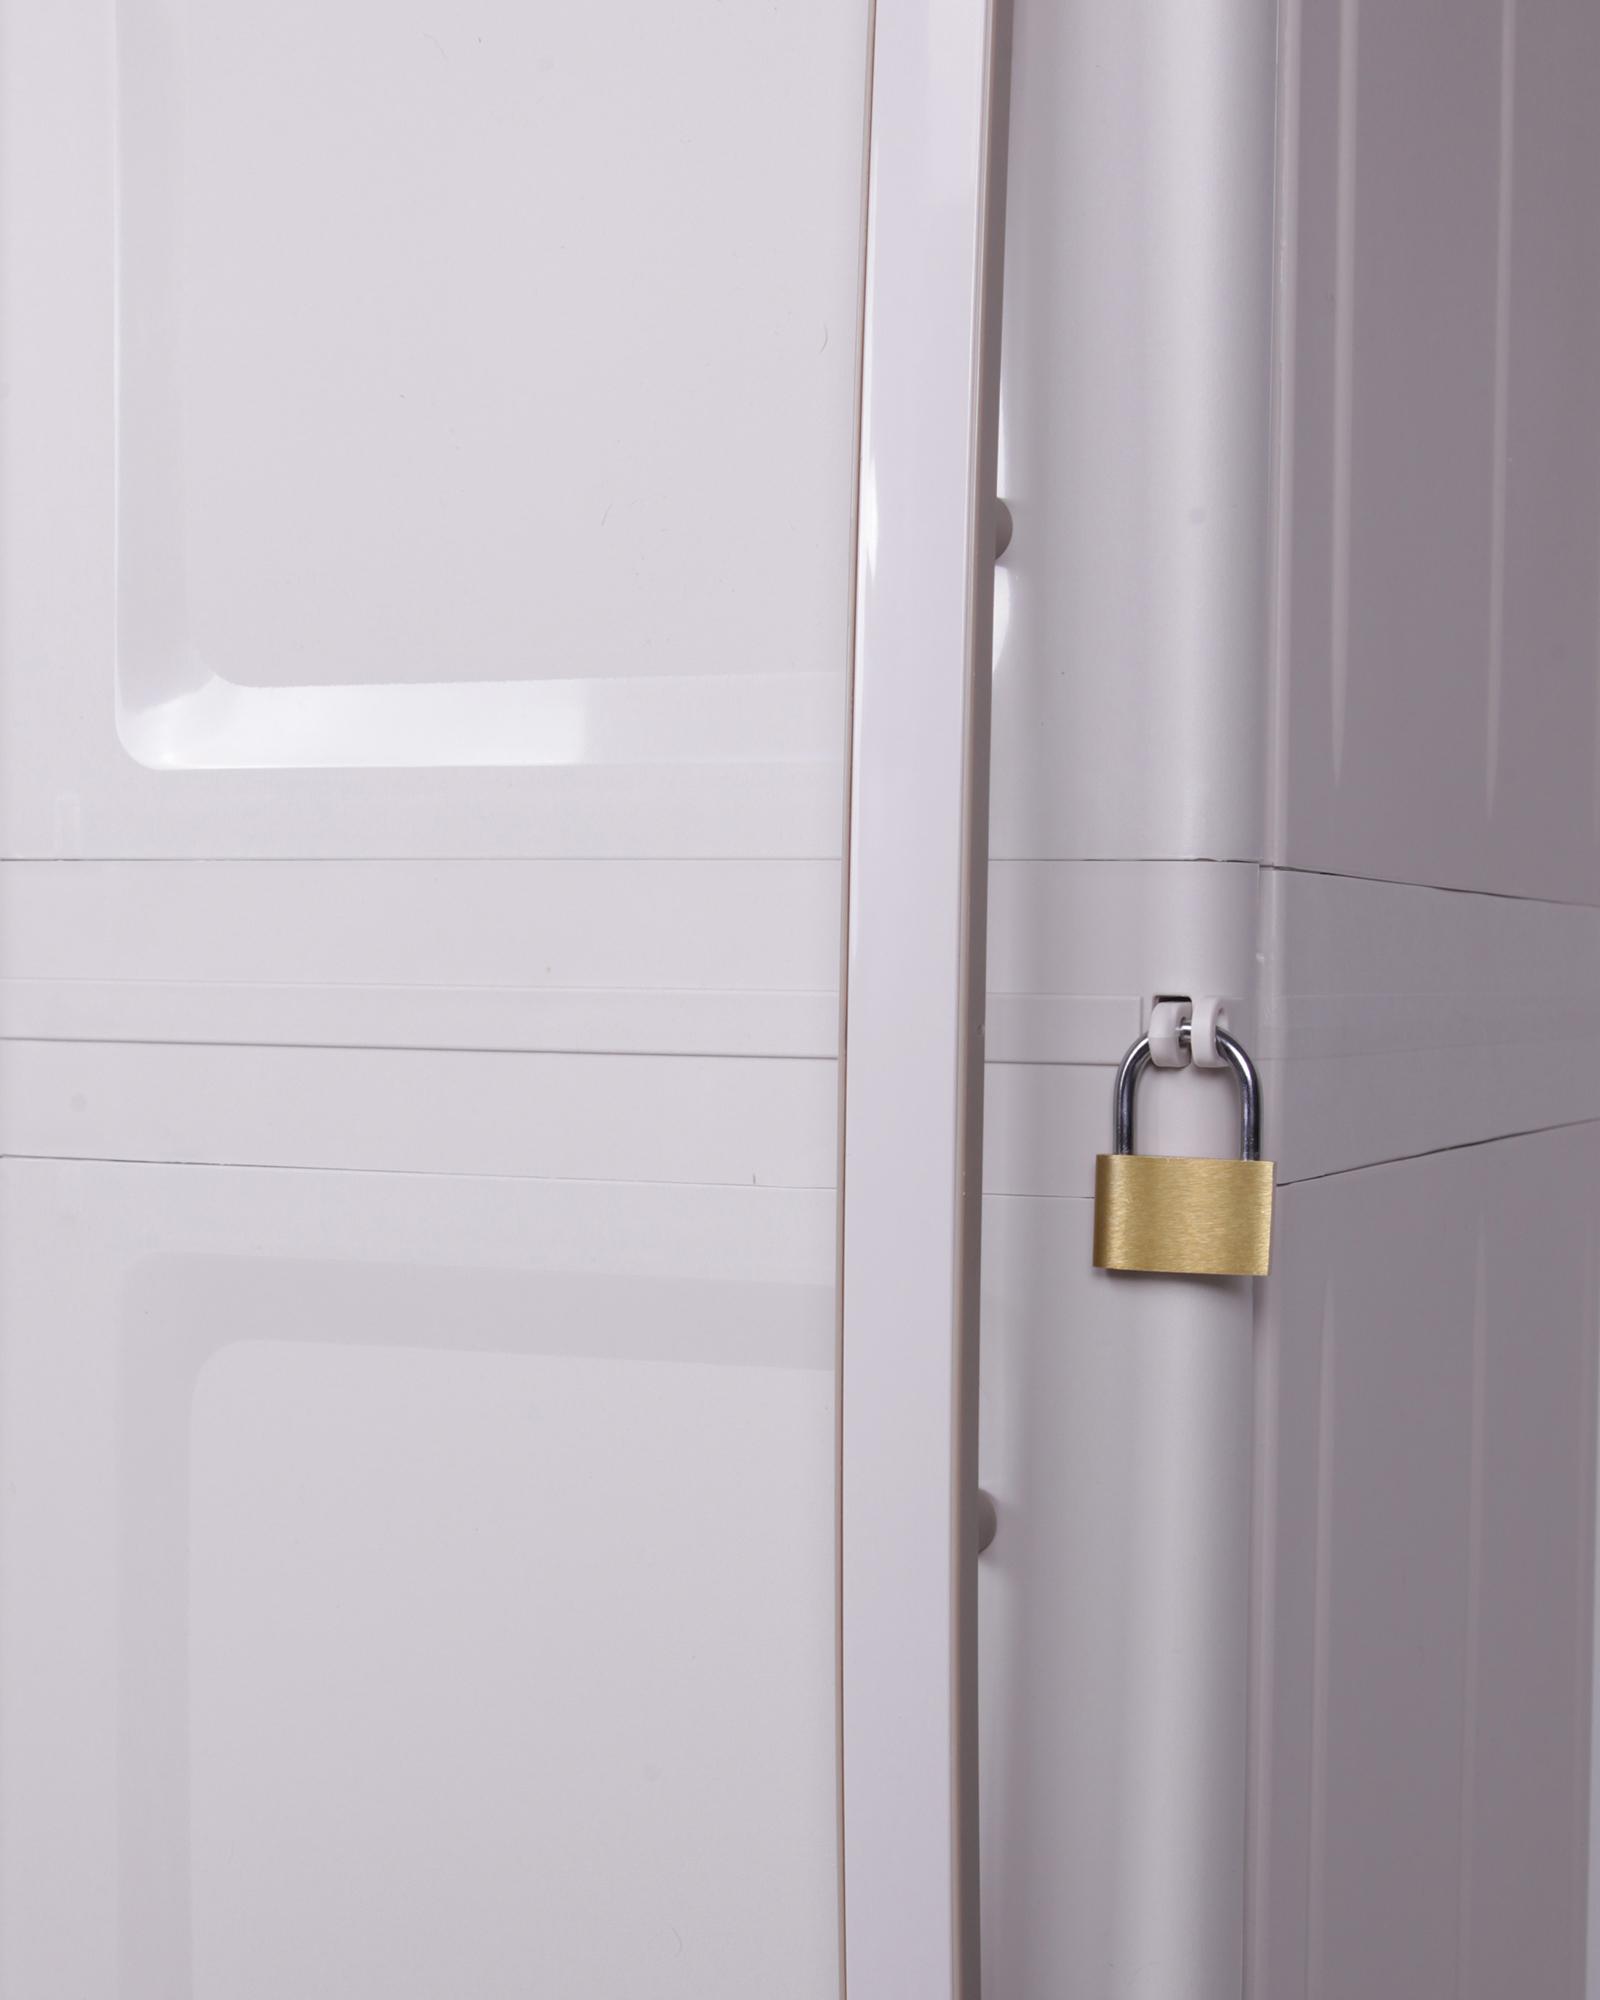 ondis24 kunststoffschrank nischenschrank excellent g nstig. Black Bedroom Furniture Sets. Home Design Ideas